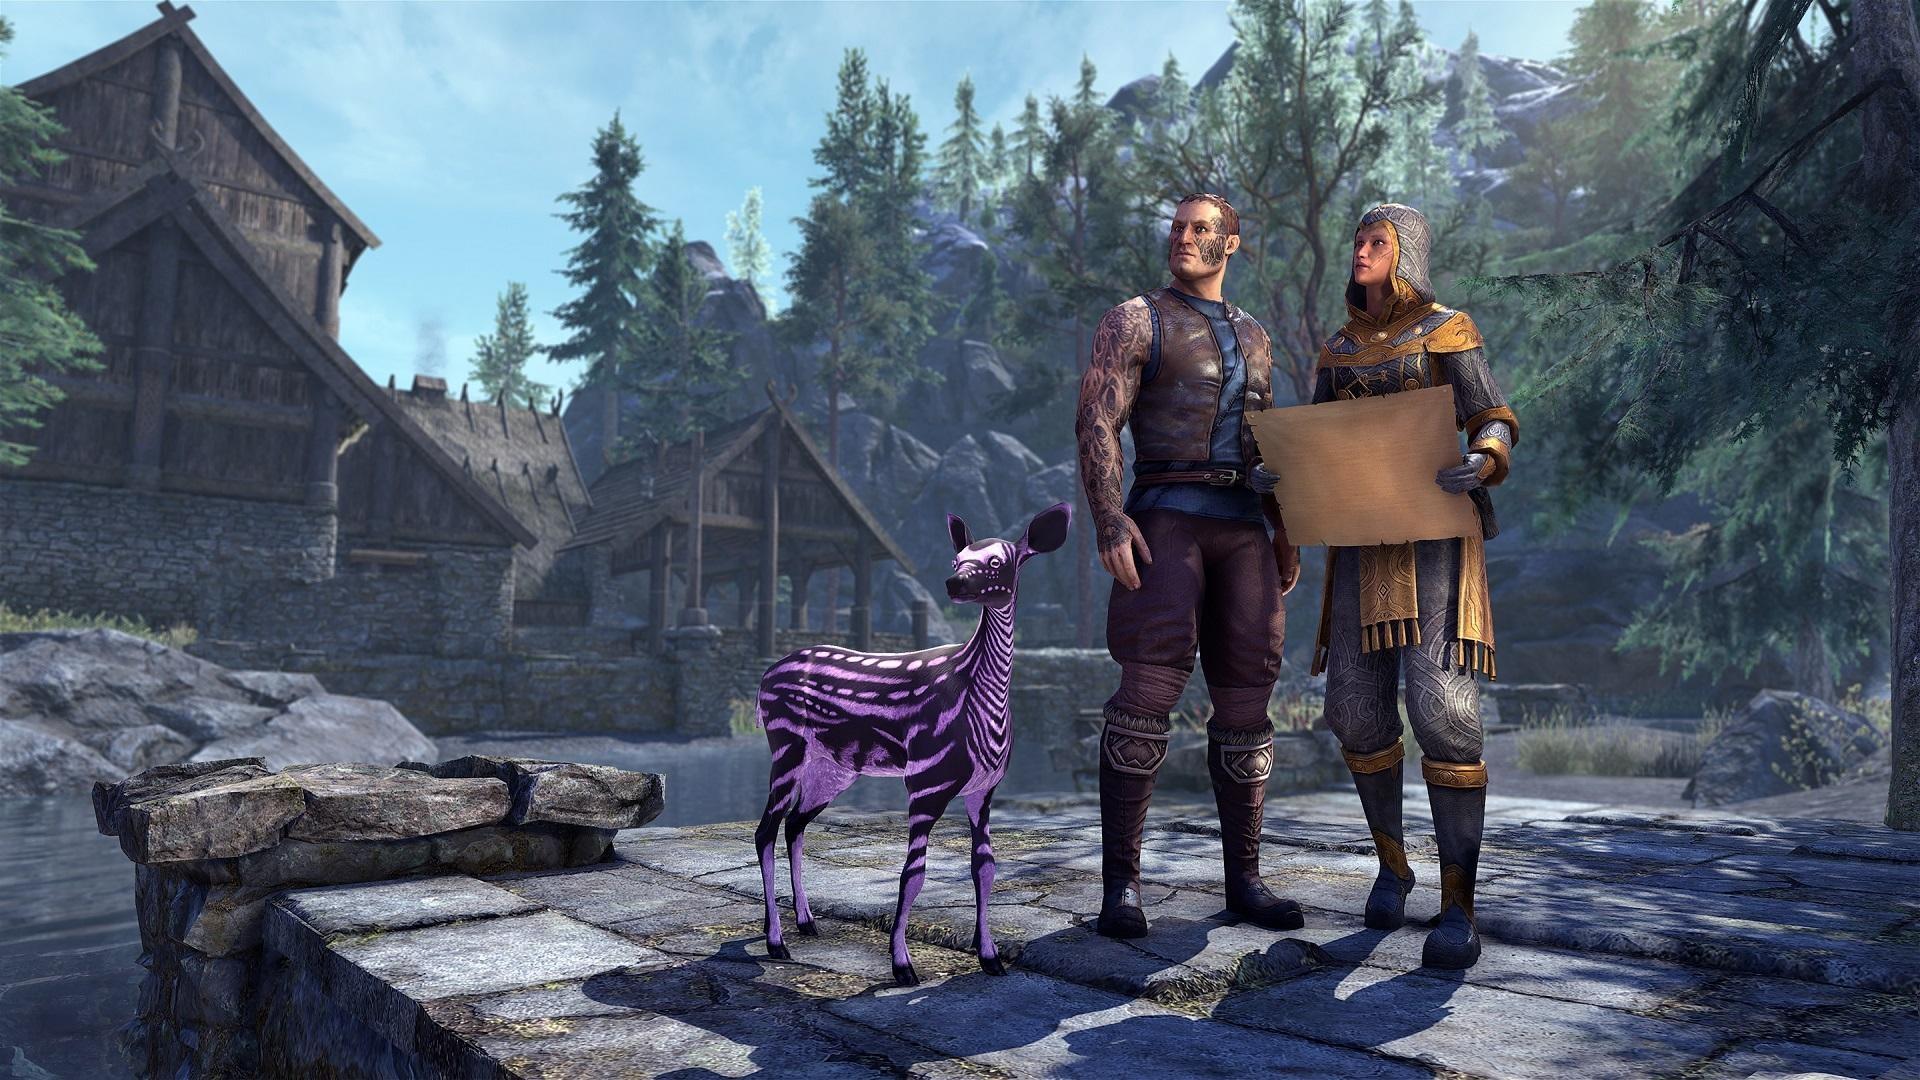 The Elder Scrolls Online Announces Months Of Events In Preparation Of Tamriel Together Celebration